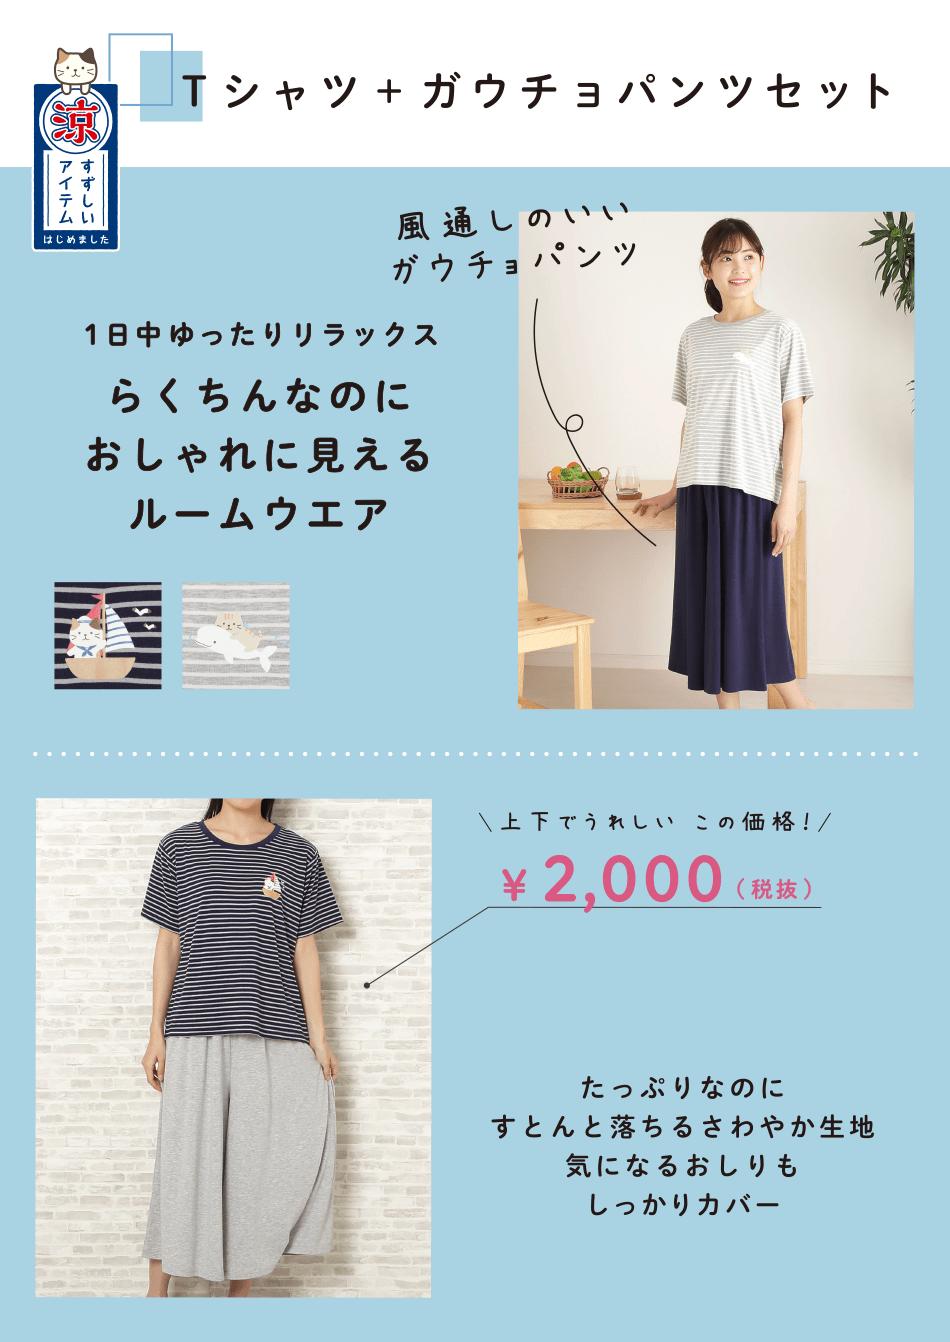 FukuFukuNyanko Tシャツ+ガウチョパンツセット